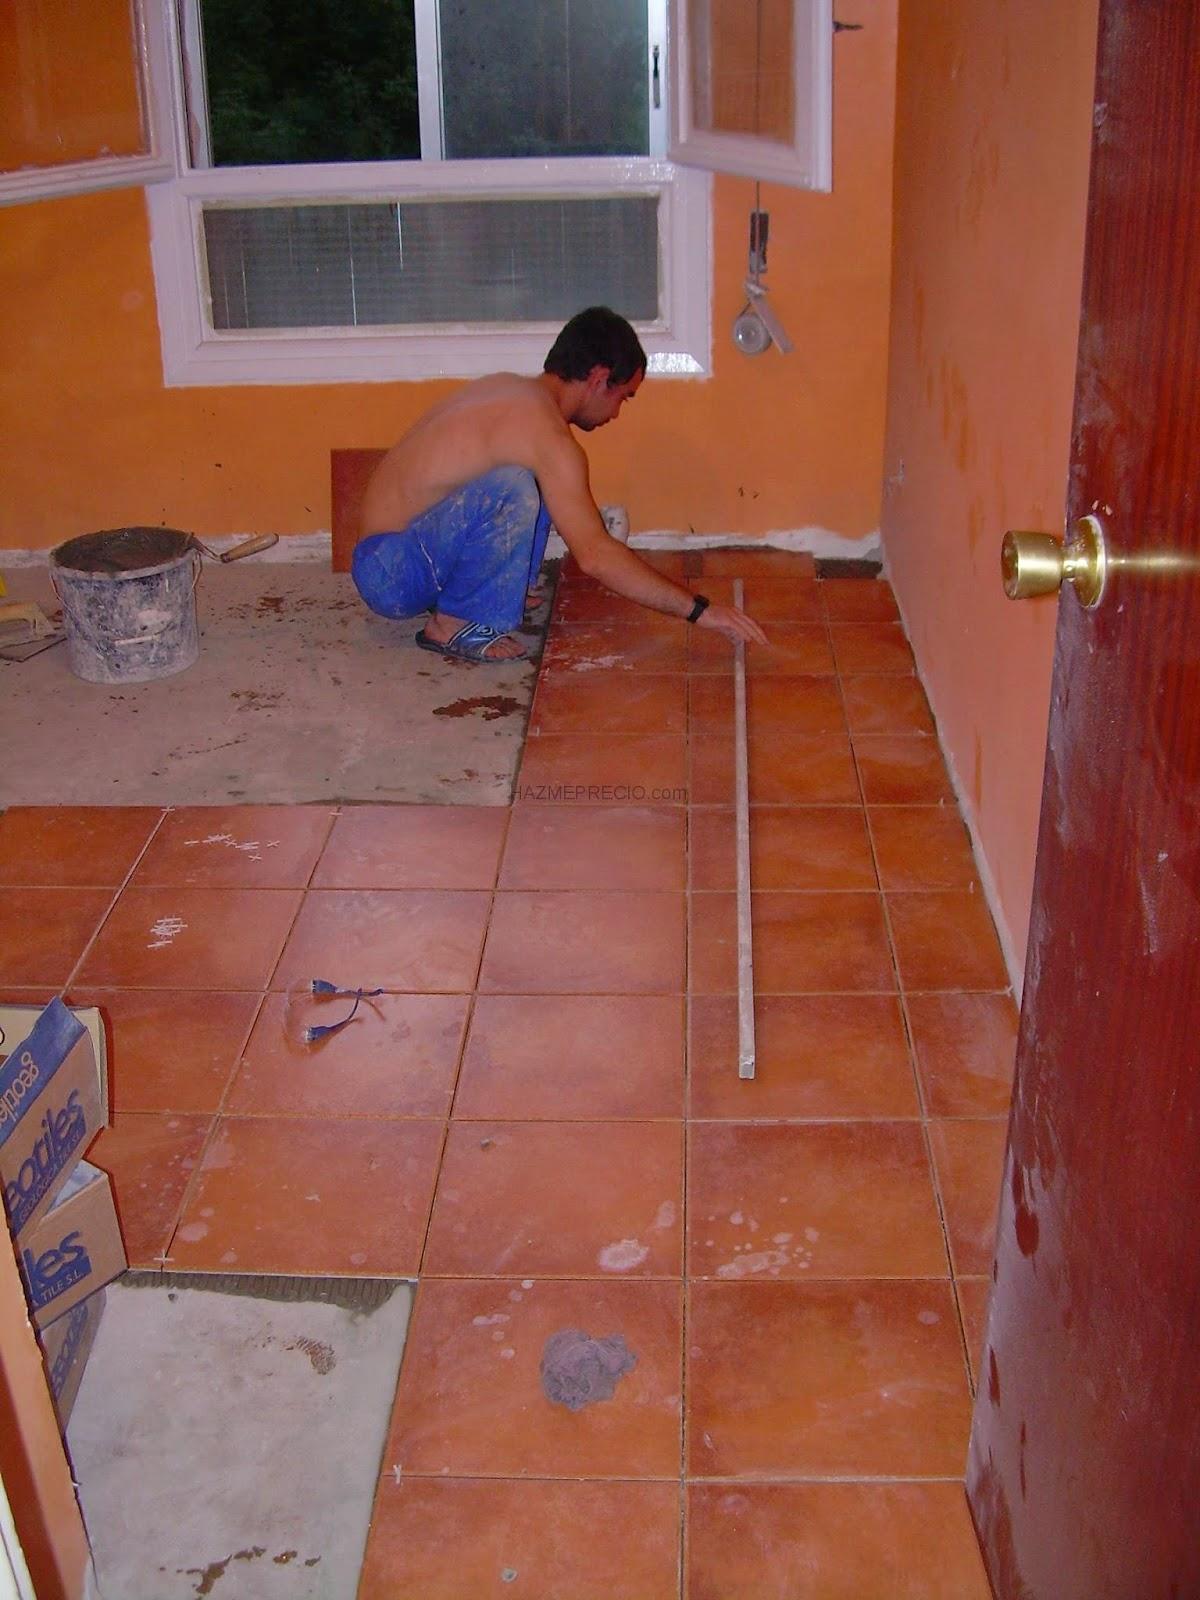 Como poner suelo affordable suelo porcelanico imitacin - Colocar suelo porcelanico ...